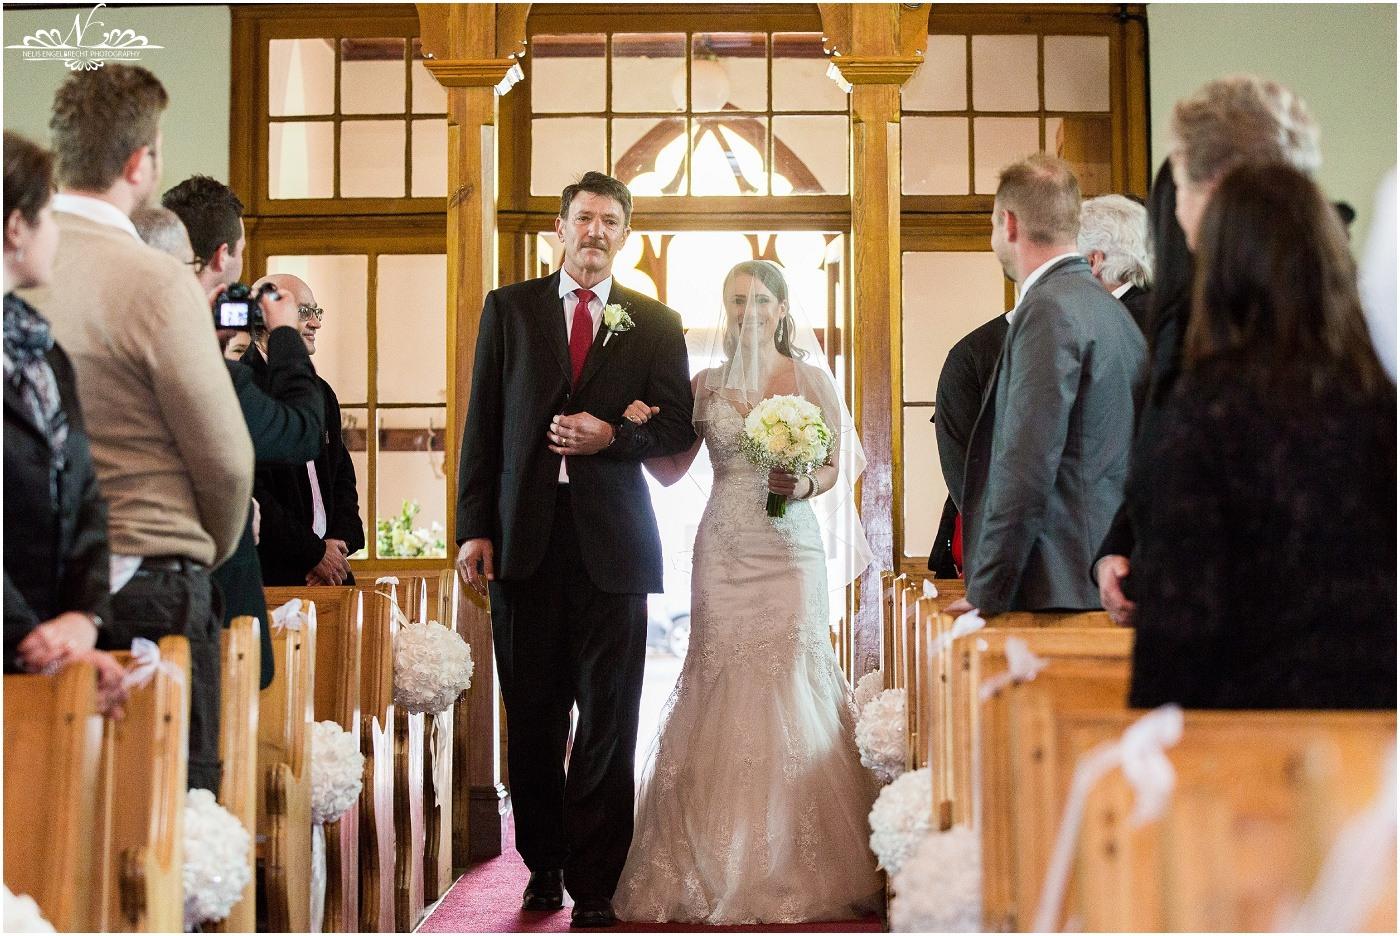 Eensgezind-Wedding-Photos-Nelis-Engelbrecht-Photography-058